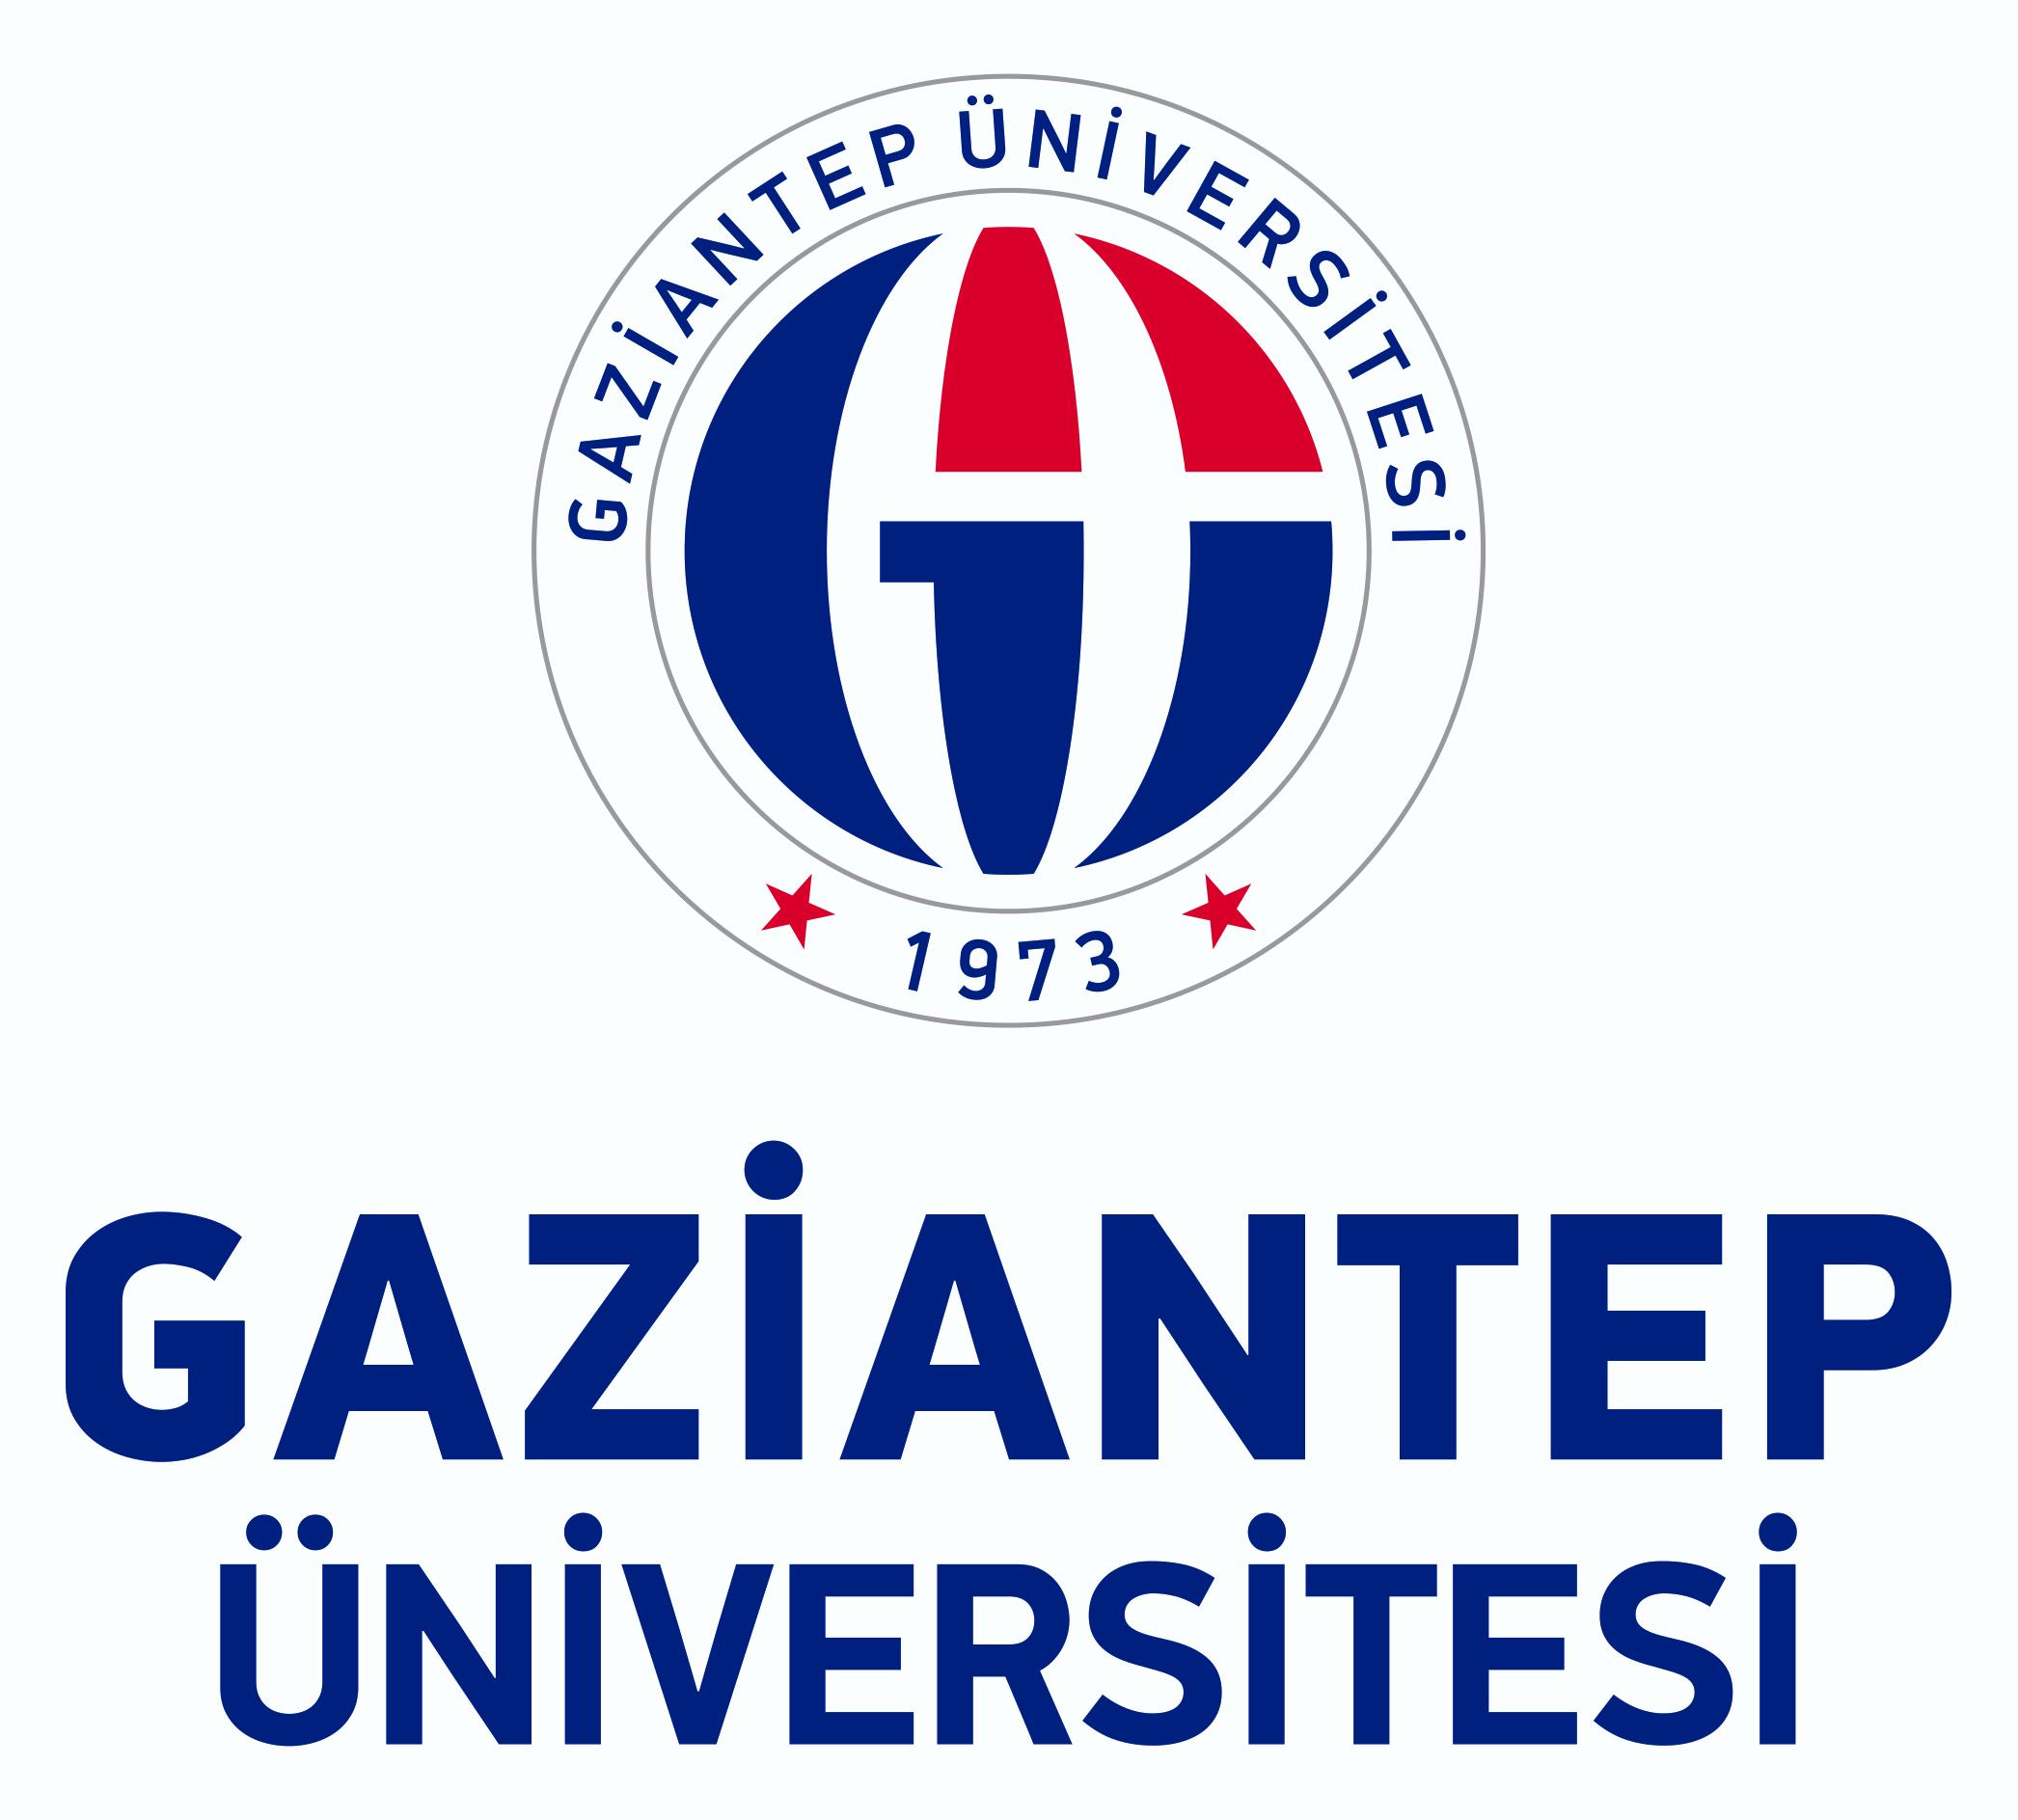 TUAS | GAZIANTEP UNIVERSITY